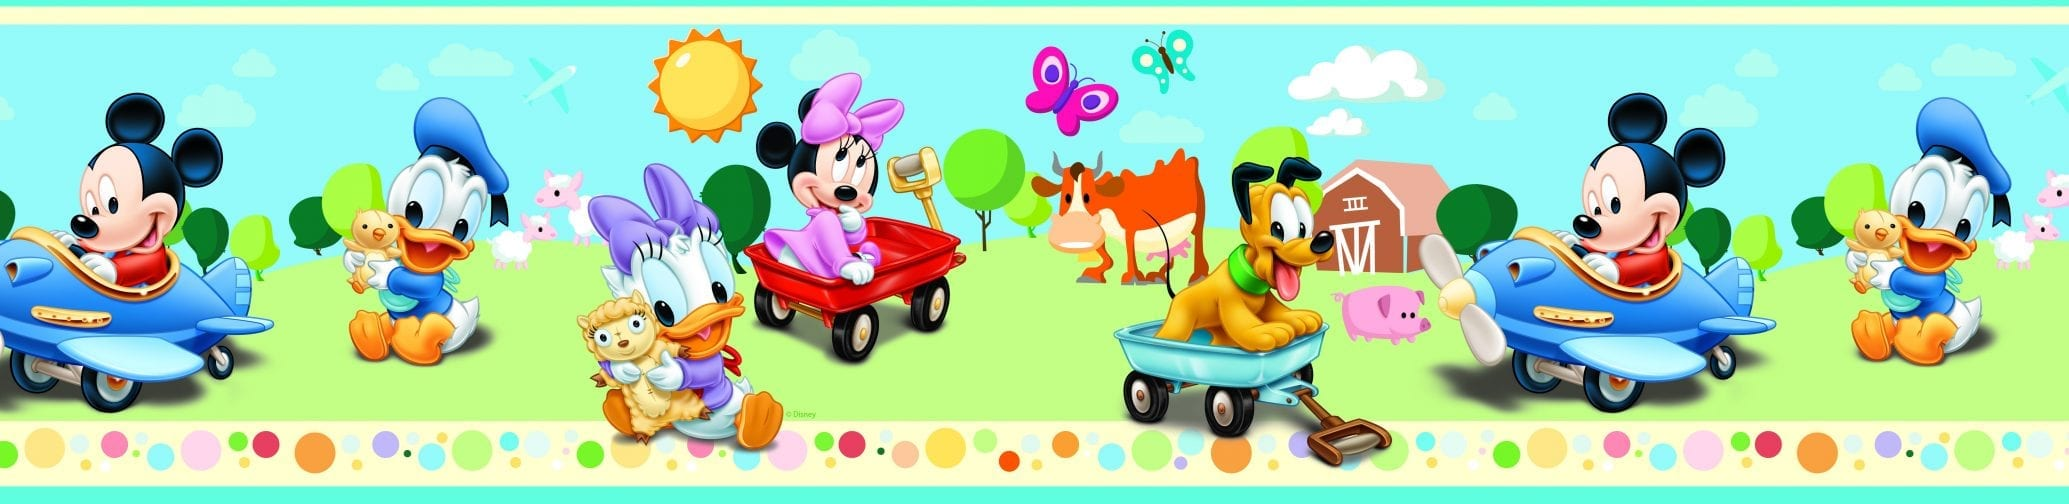 Guarda infantil Mickey baby Disney 2565-1